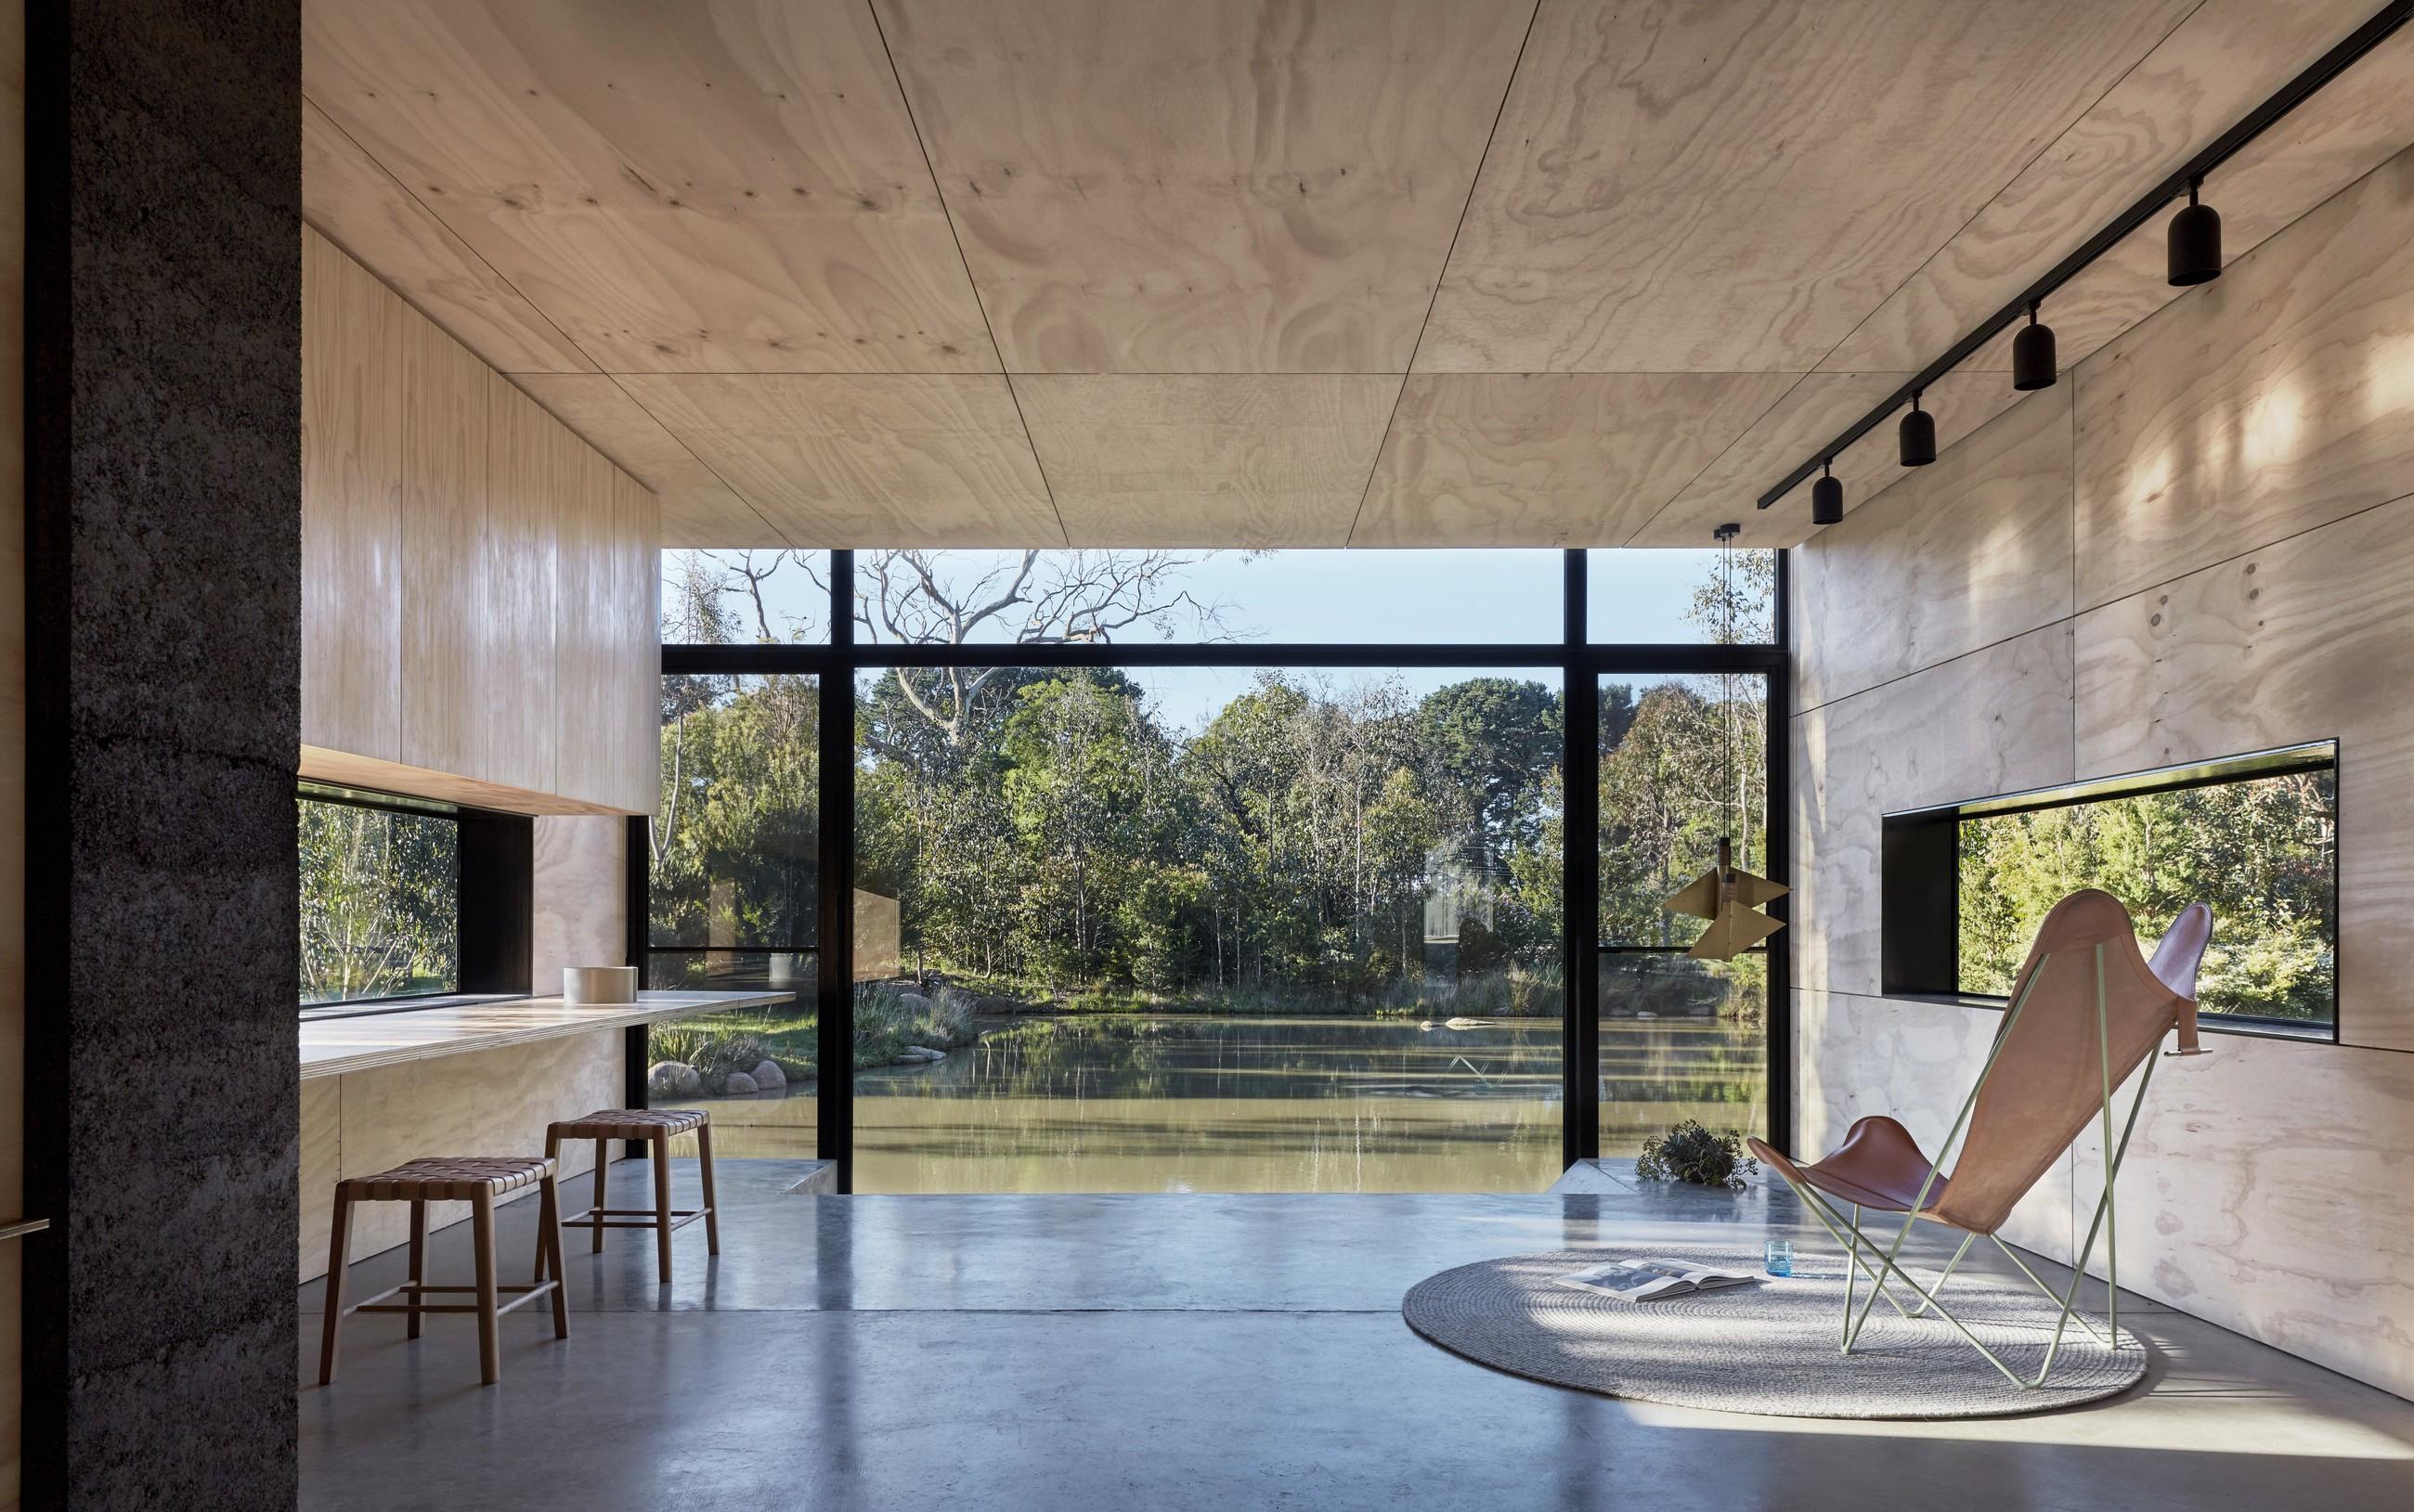 Branch Studio Architects